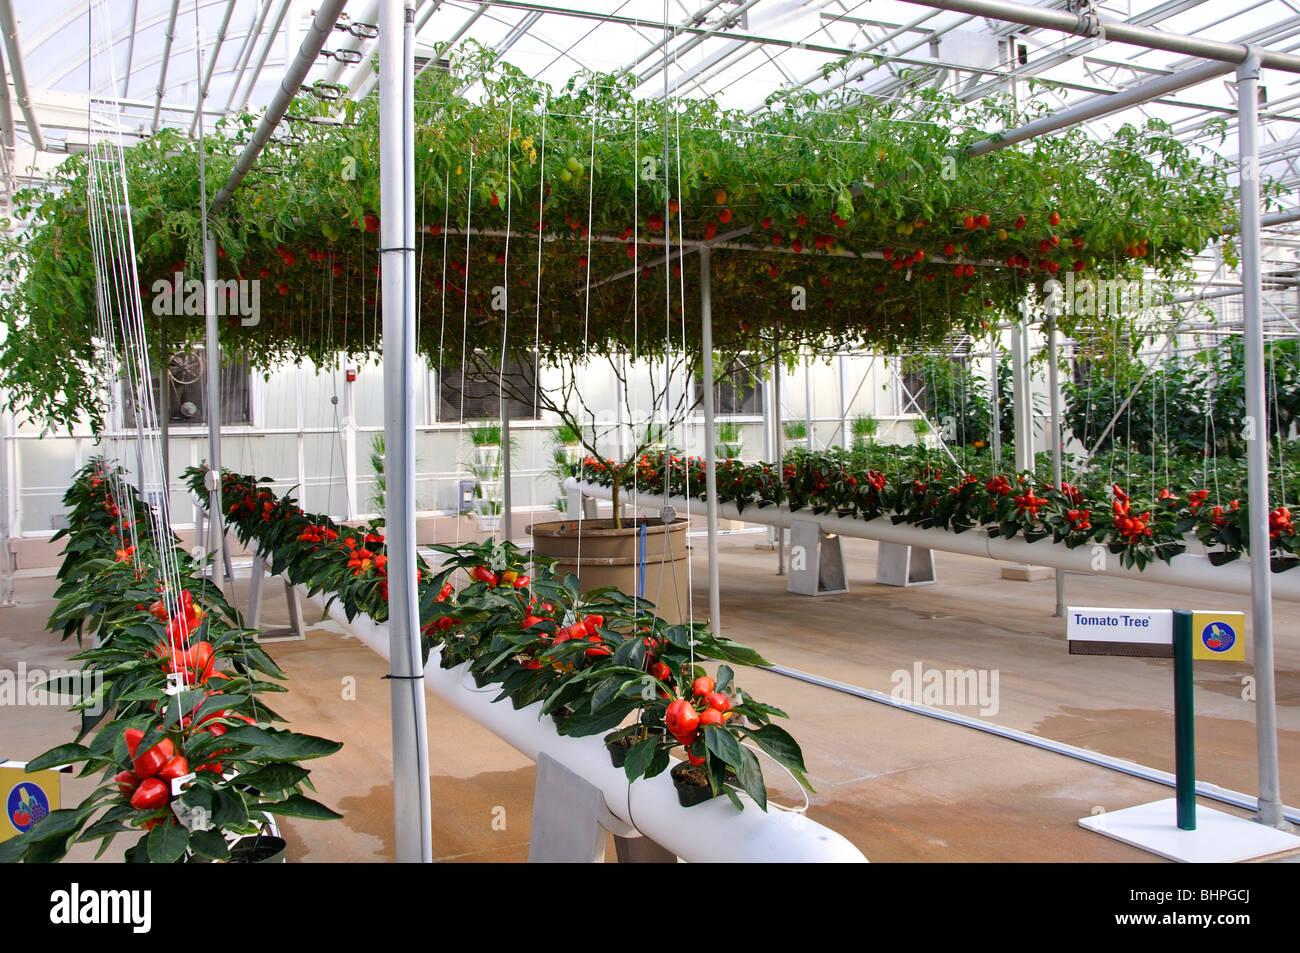 Hydroponic Garden Hydroponics Biotechnology Stock Photos